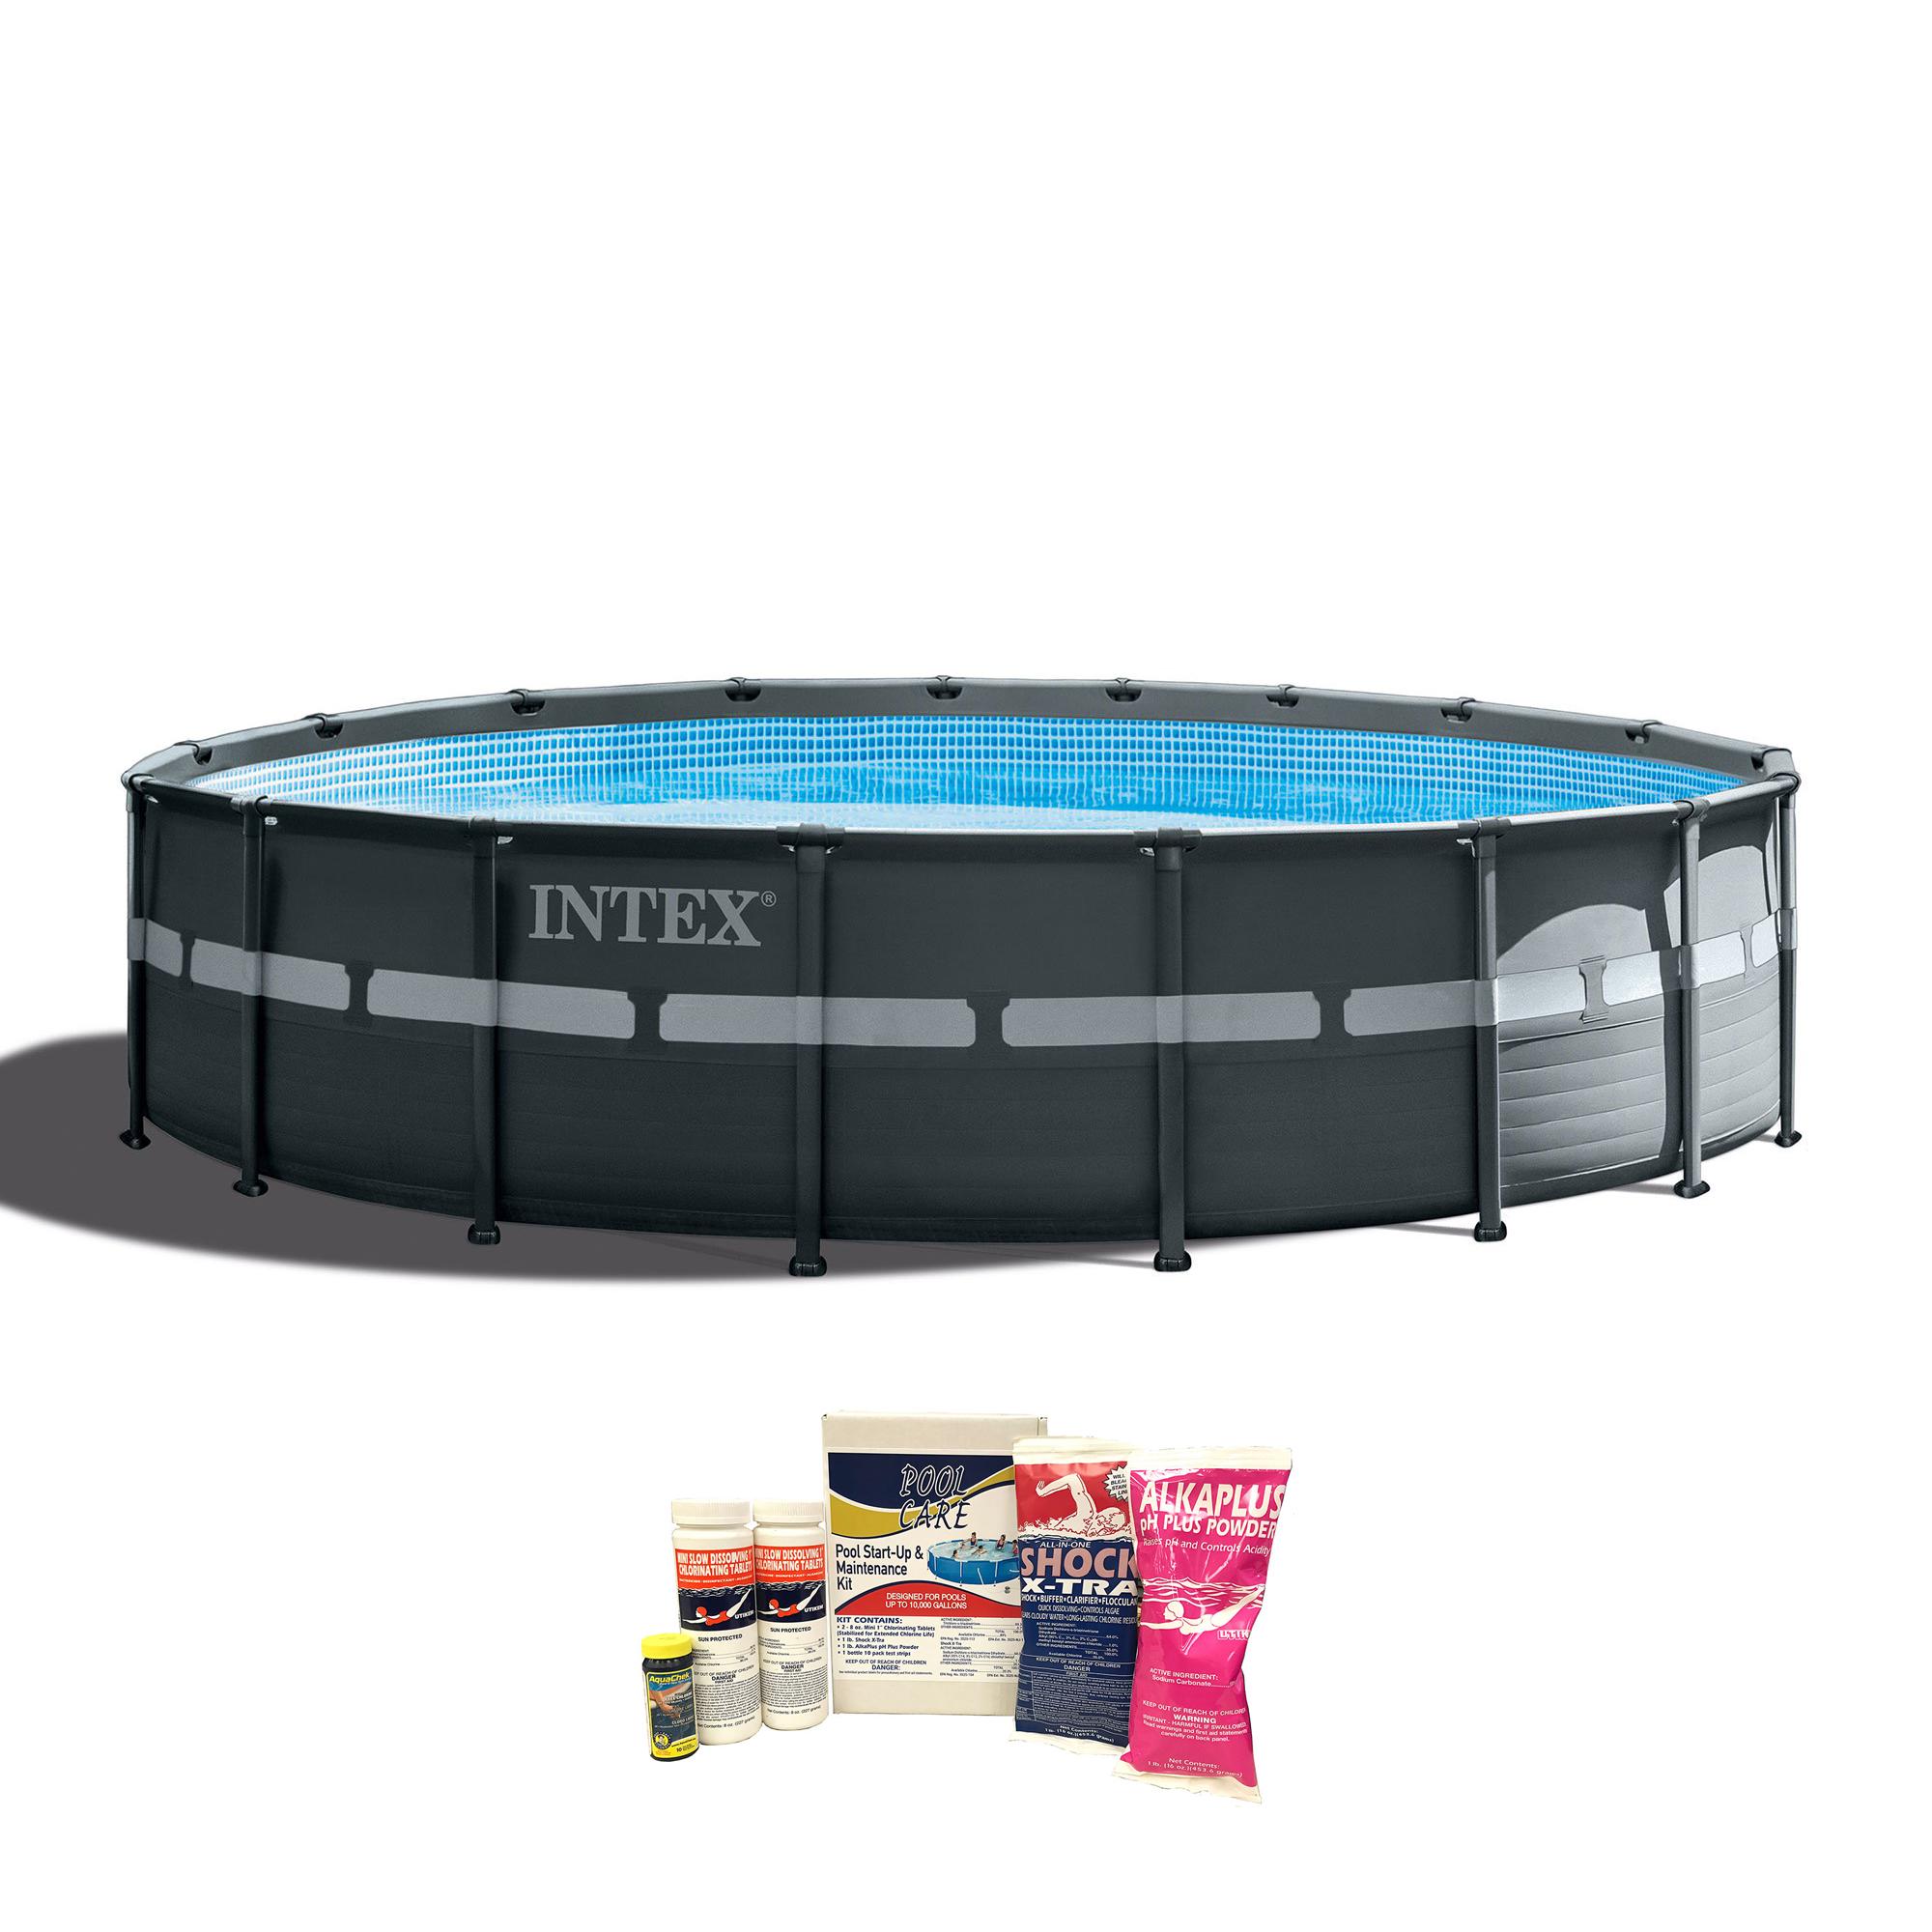 Intex 18x52 Ultra Xtra Frame Above Ground Pool W Pump Chemical